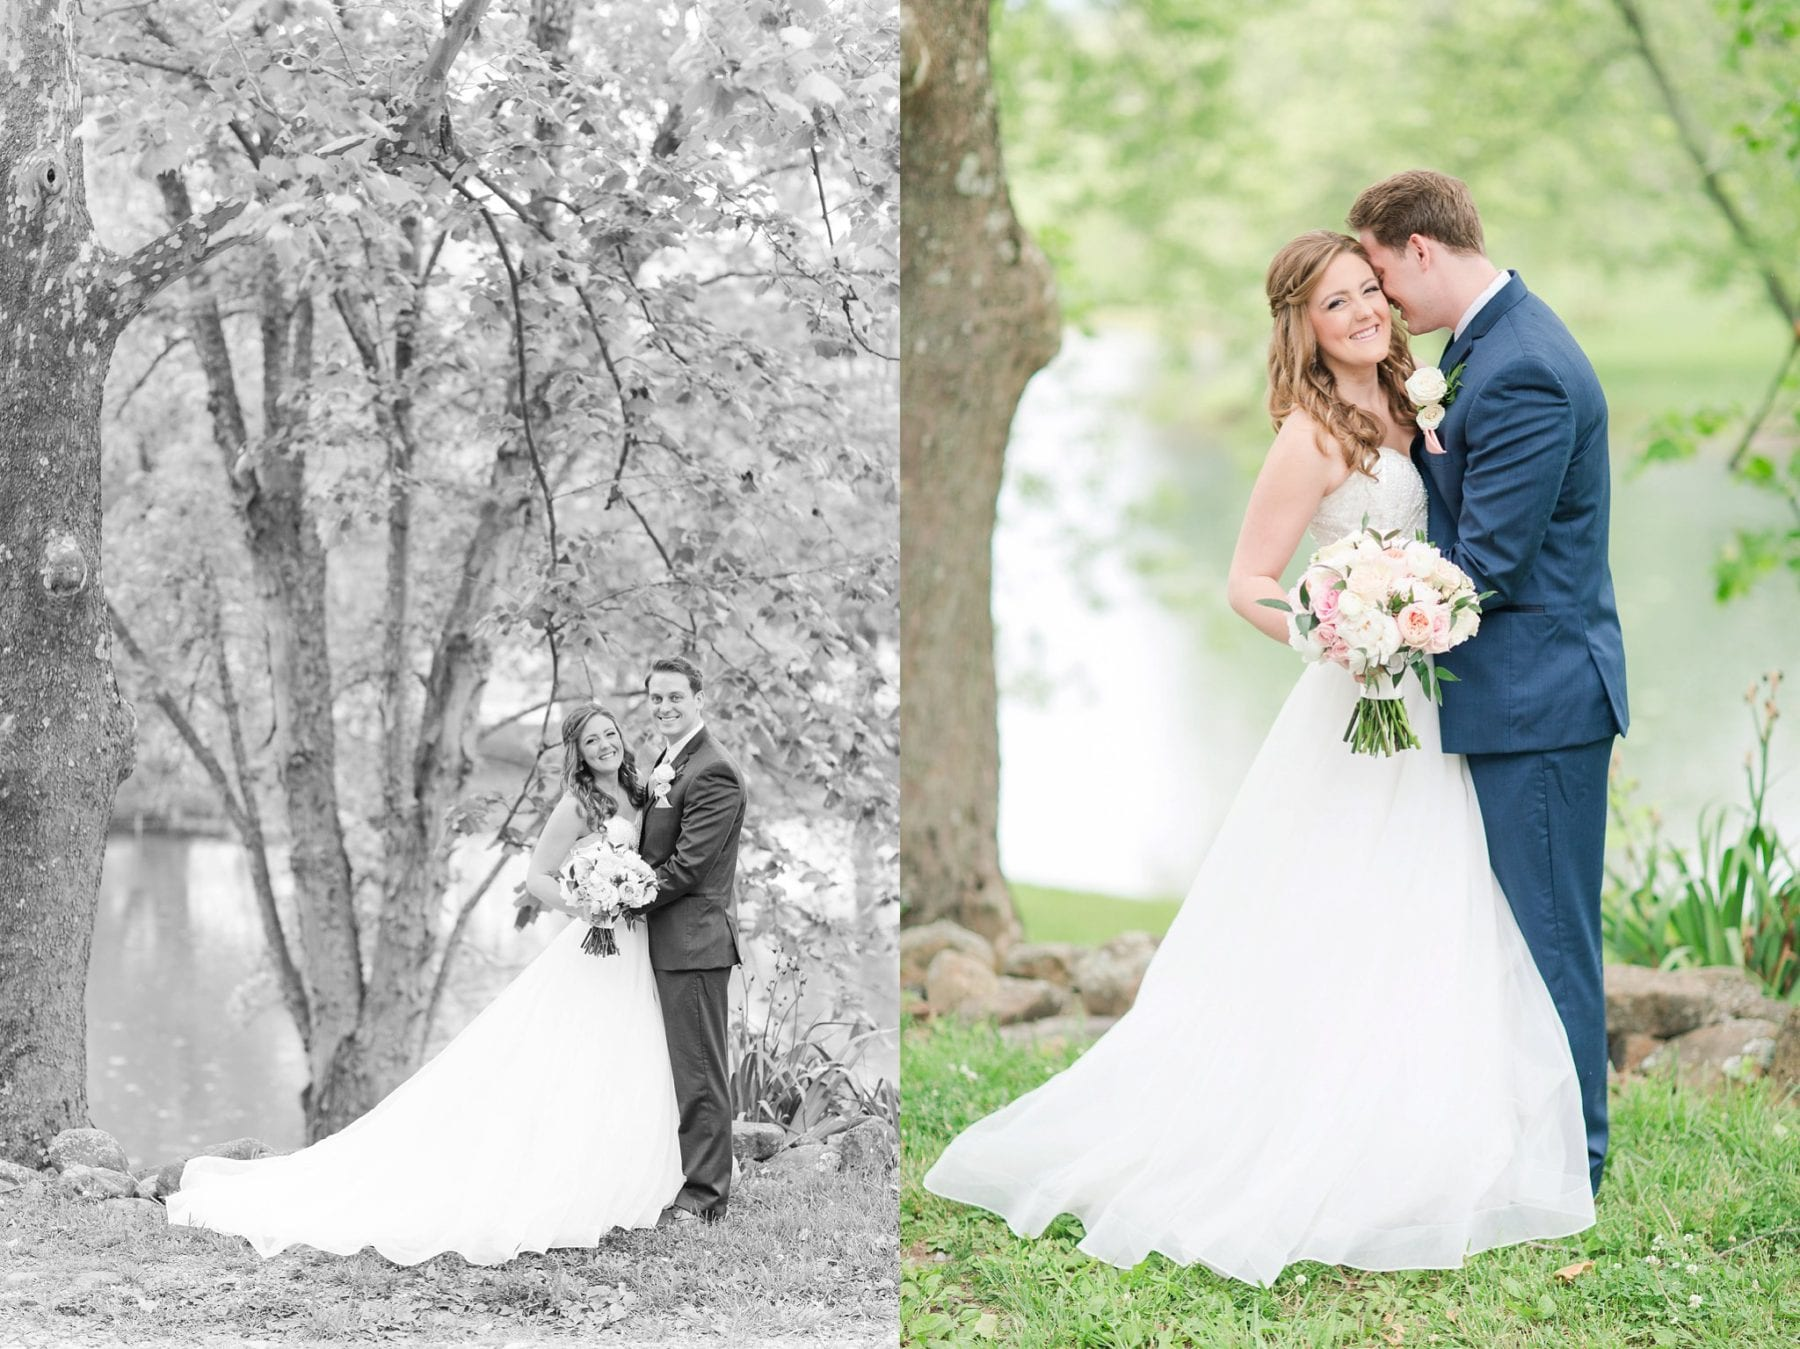 Justin & Megan Big Spring Farm Wedding Photos-95.jpg